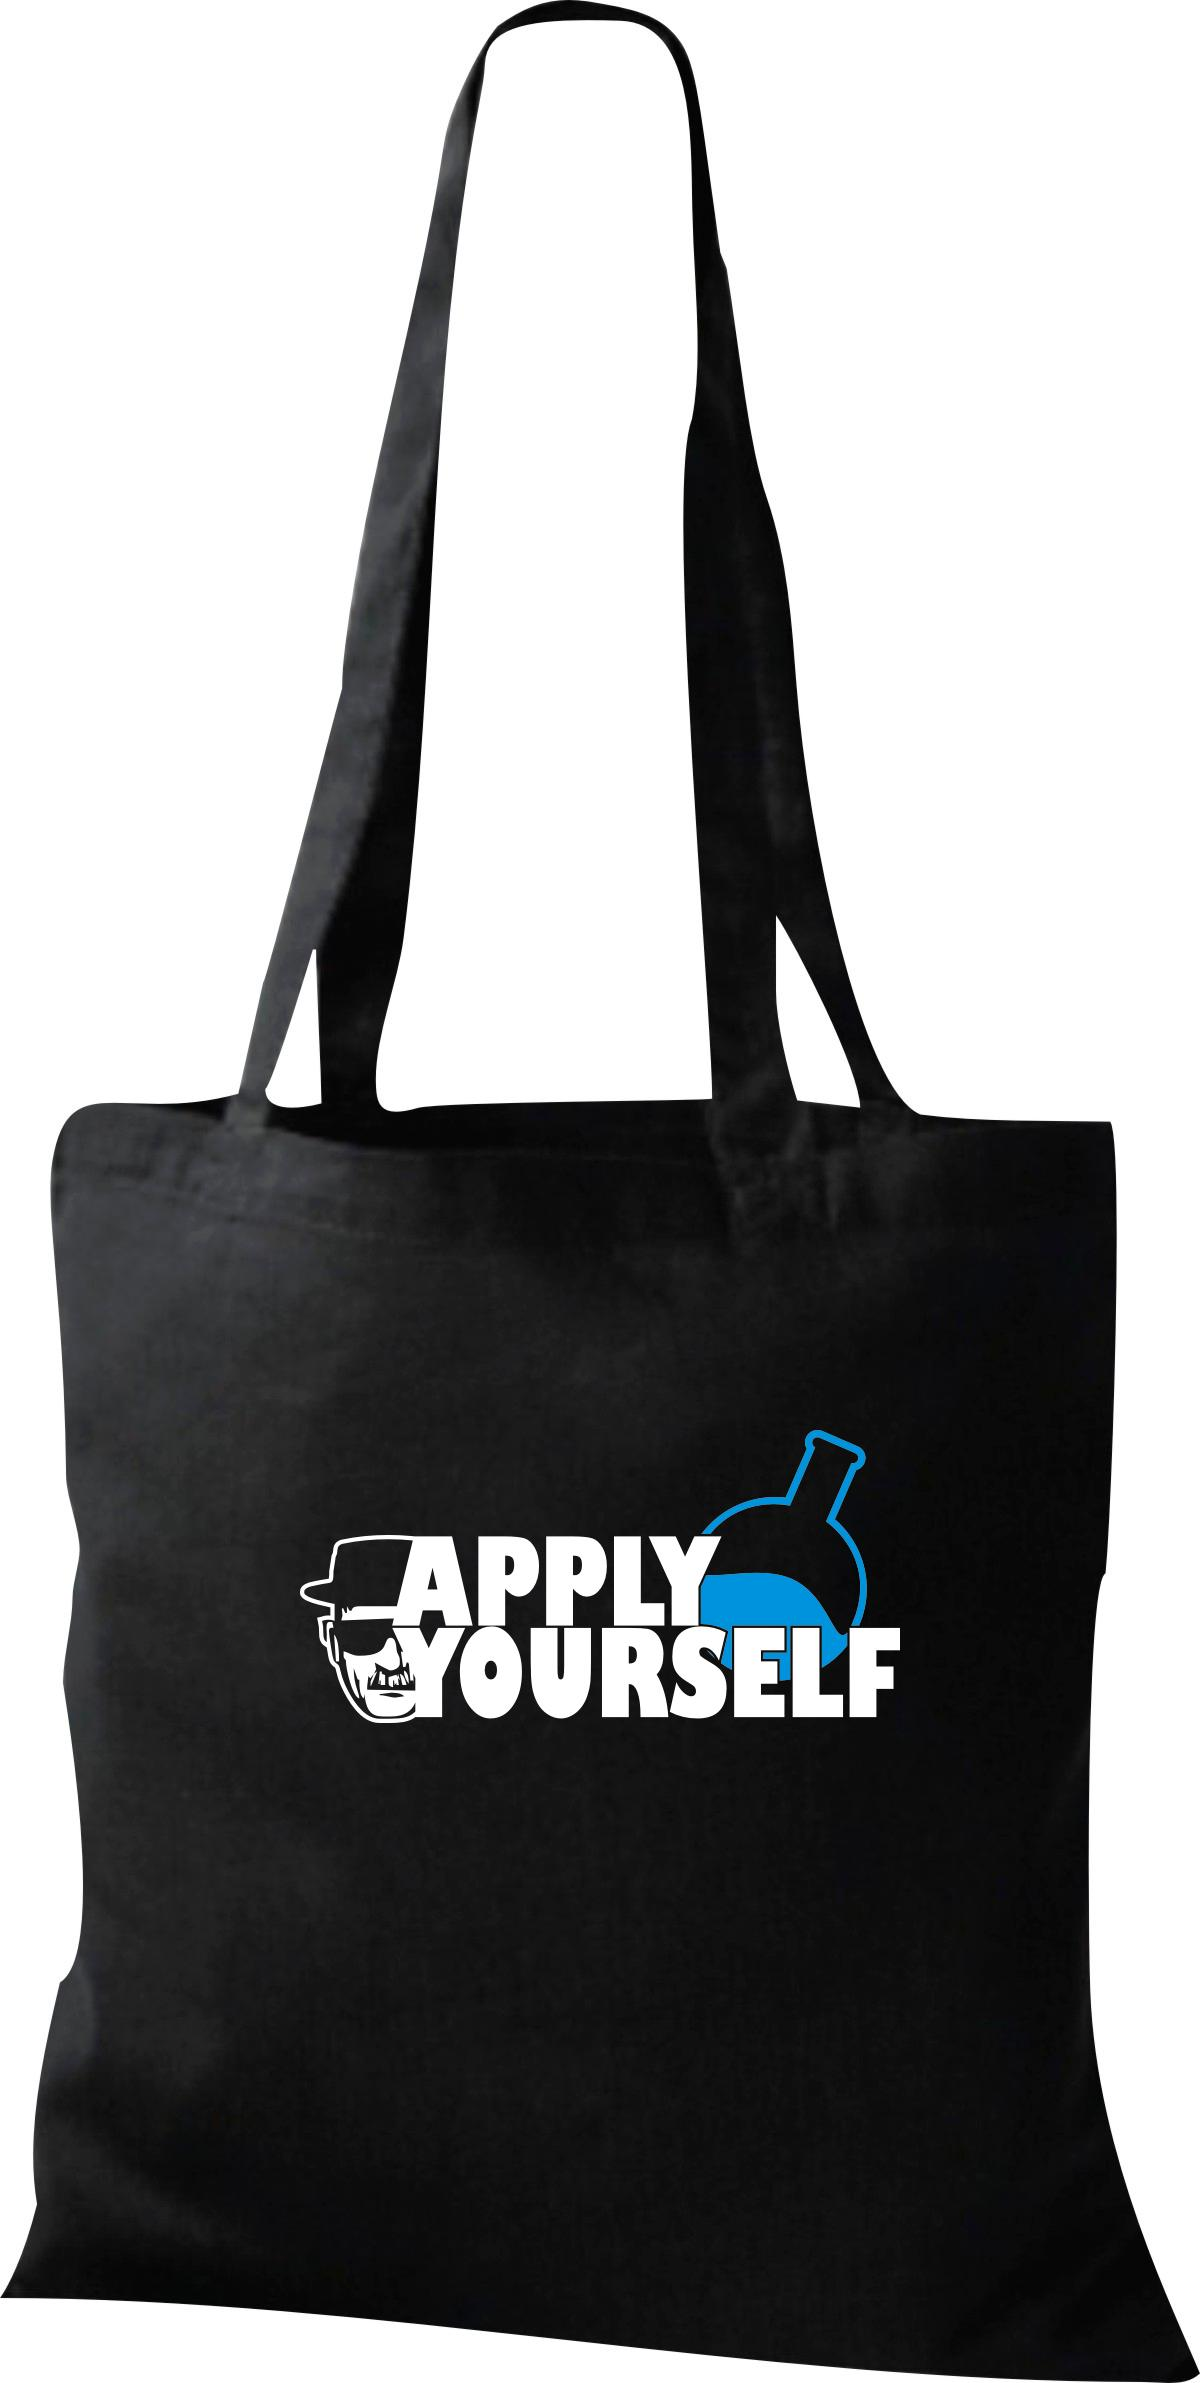 Organic-Bag-Shopper-Apply-Yourself-Reagenz-White